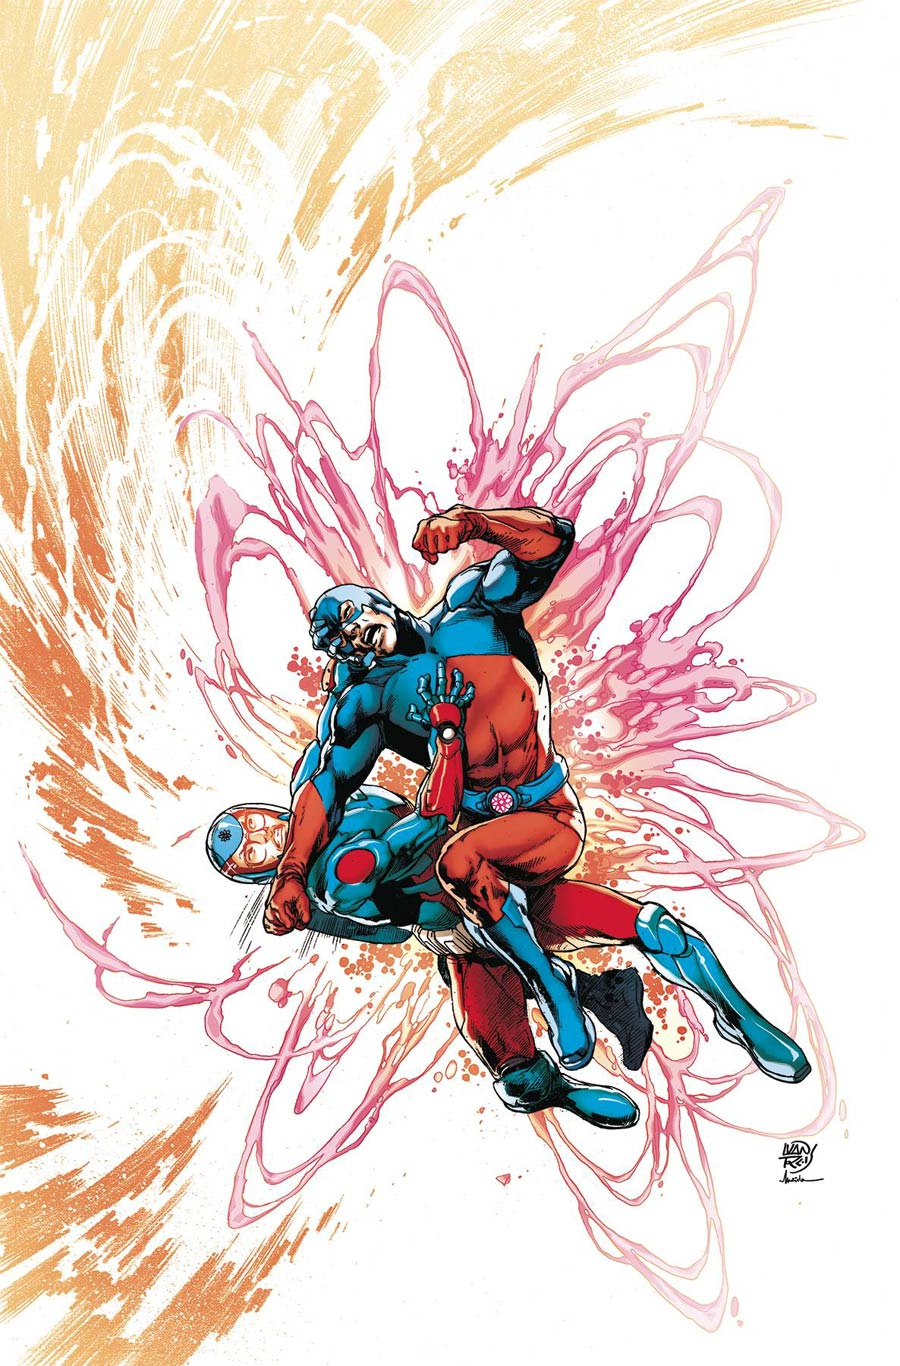 Justice League Of America Vol 5 #17 Cover A Regular Ivan Reis & Joe Prado Cover